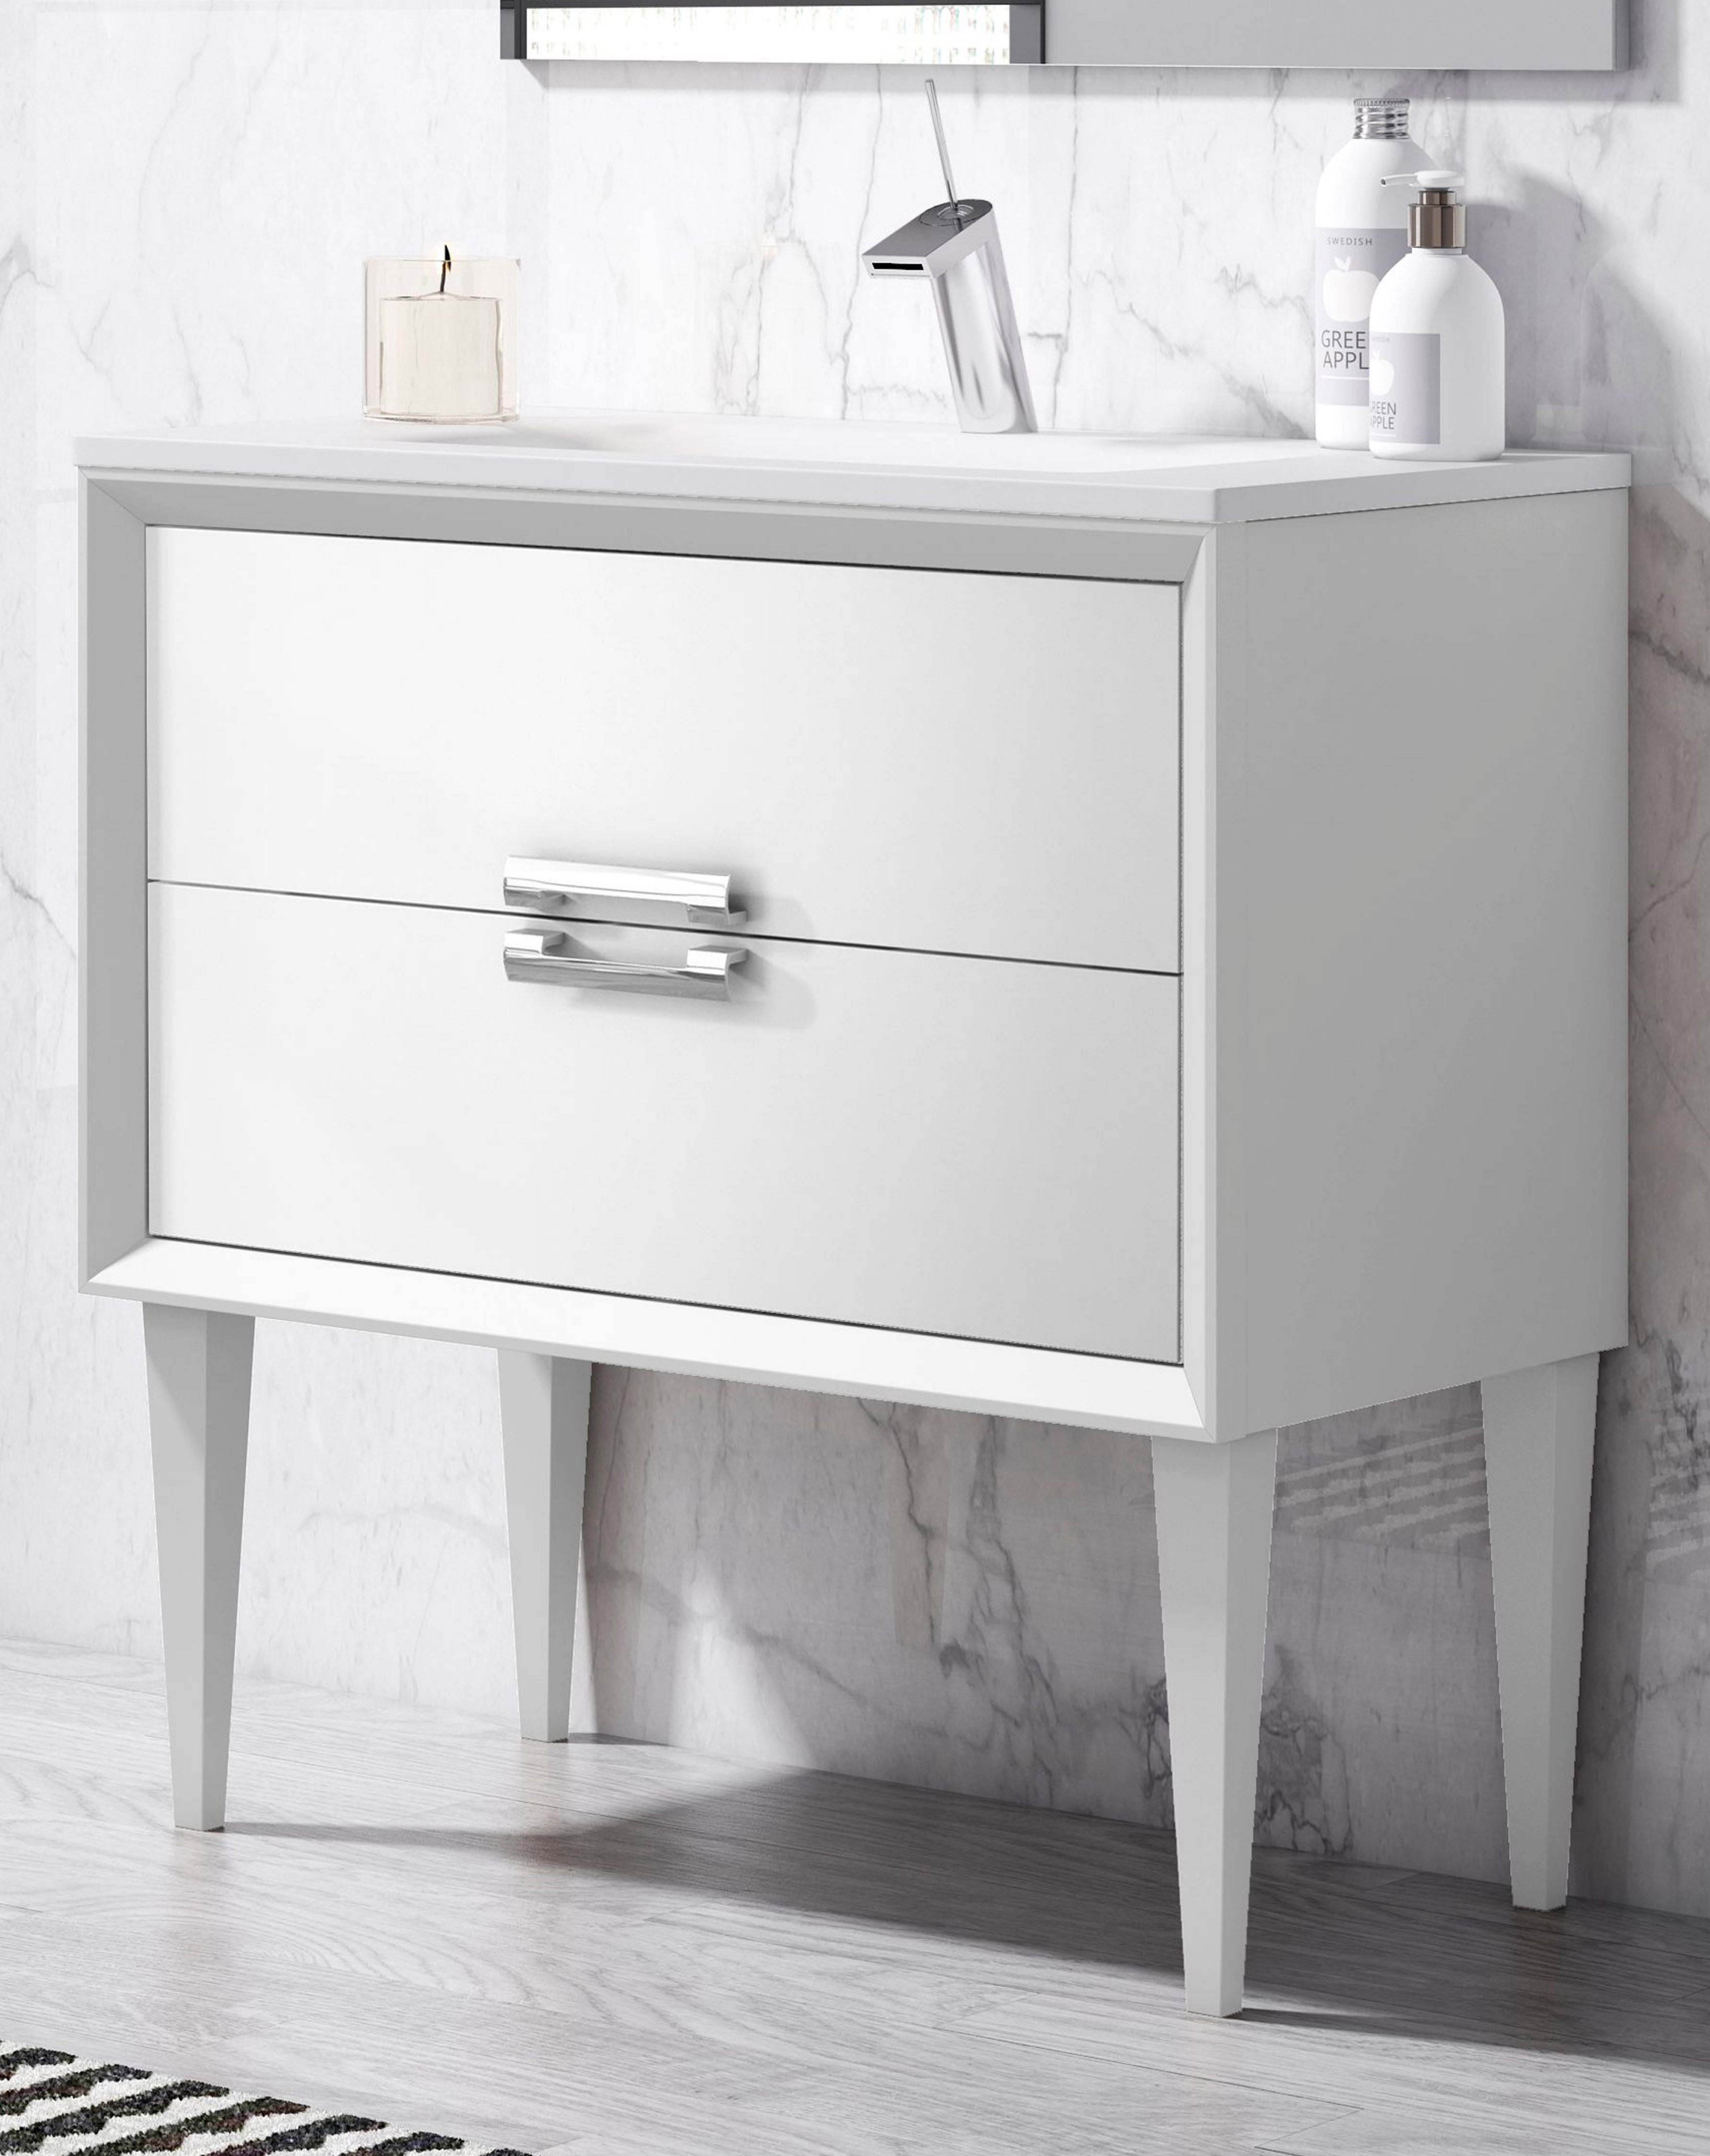 "24"" Single Sink Freestanding Vanity 2 Drawer Ceramic Sink with 4 Color Options"